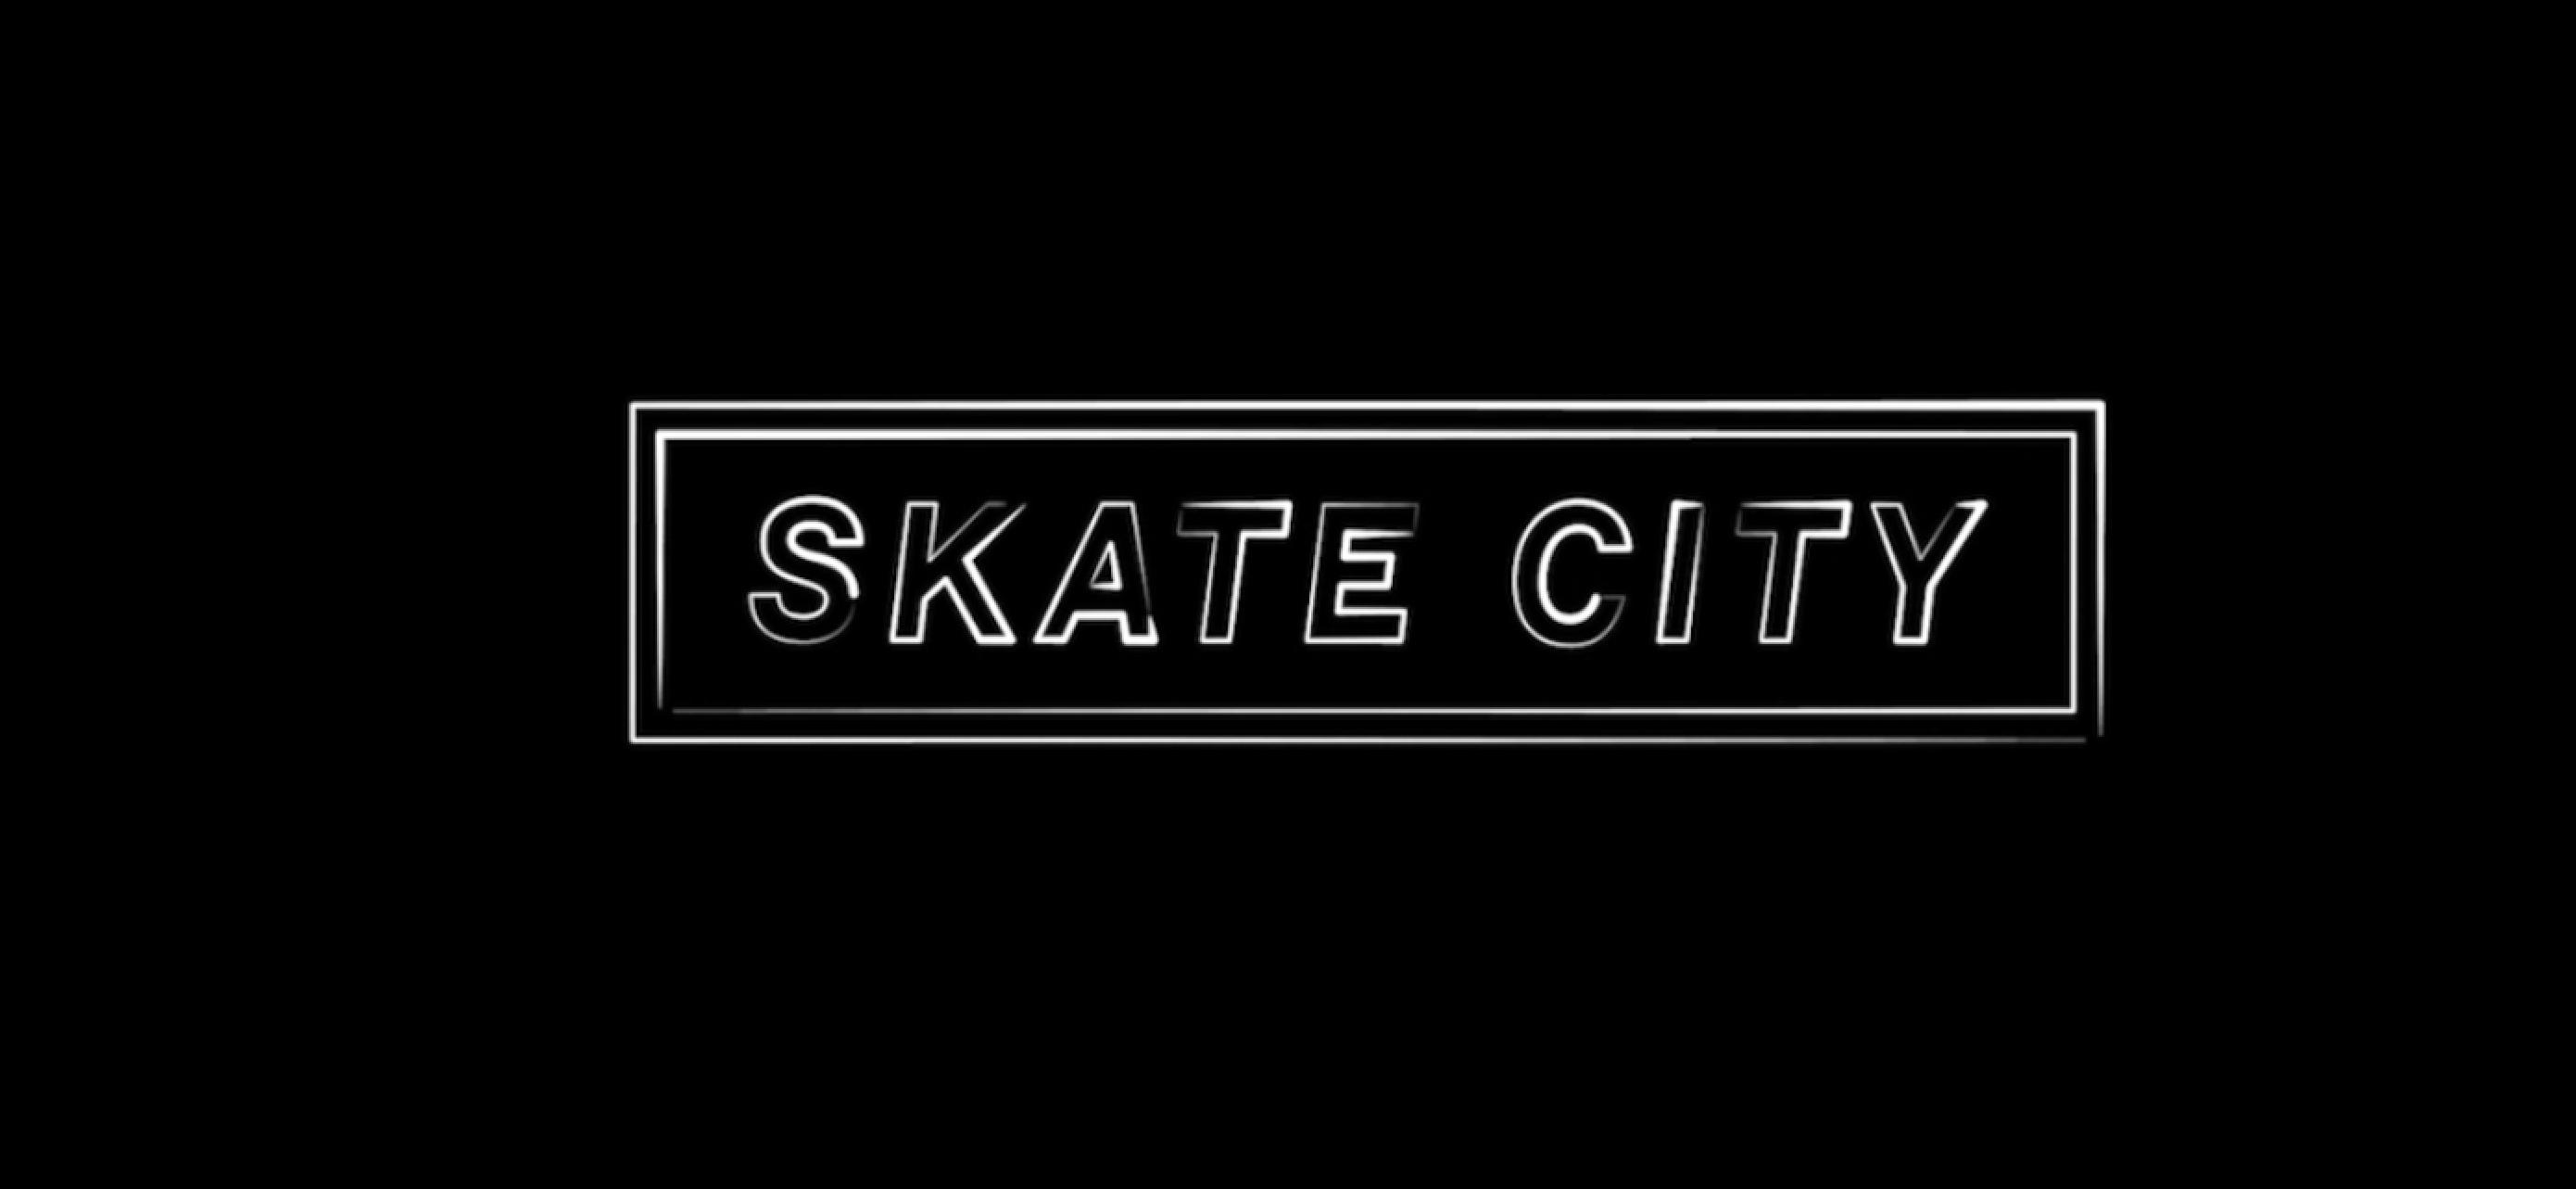 Apple Arcade: 'Skate City' Review – An Enjoyable but Barebones Skating Simulator